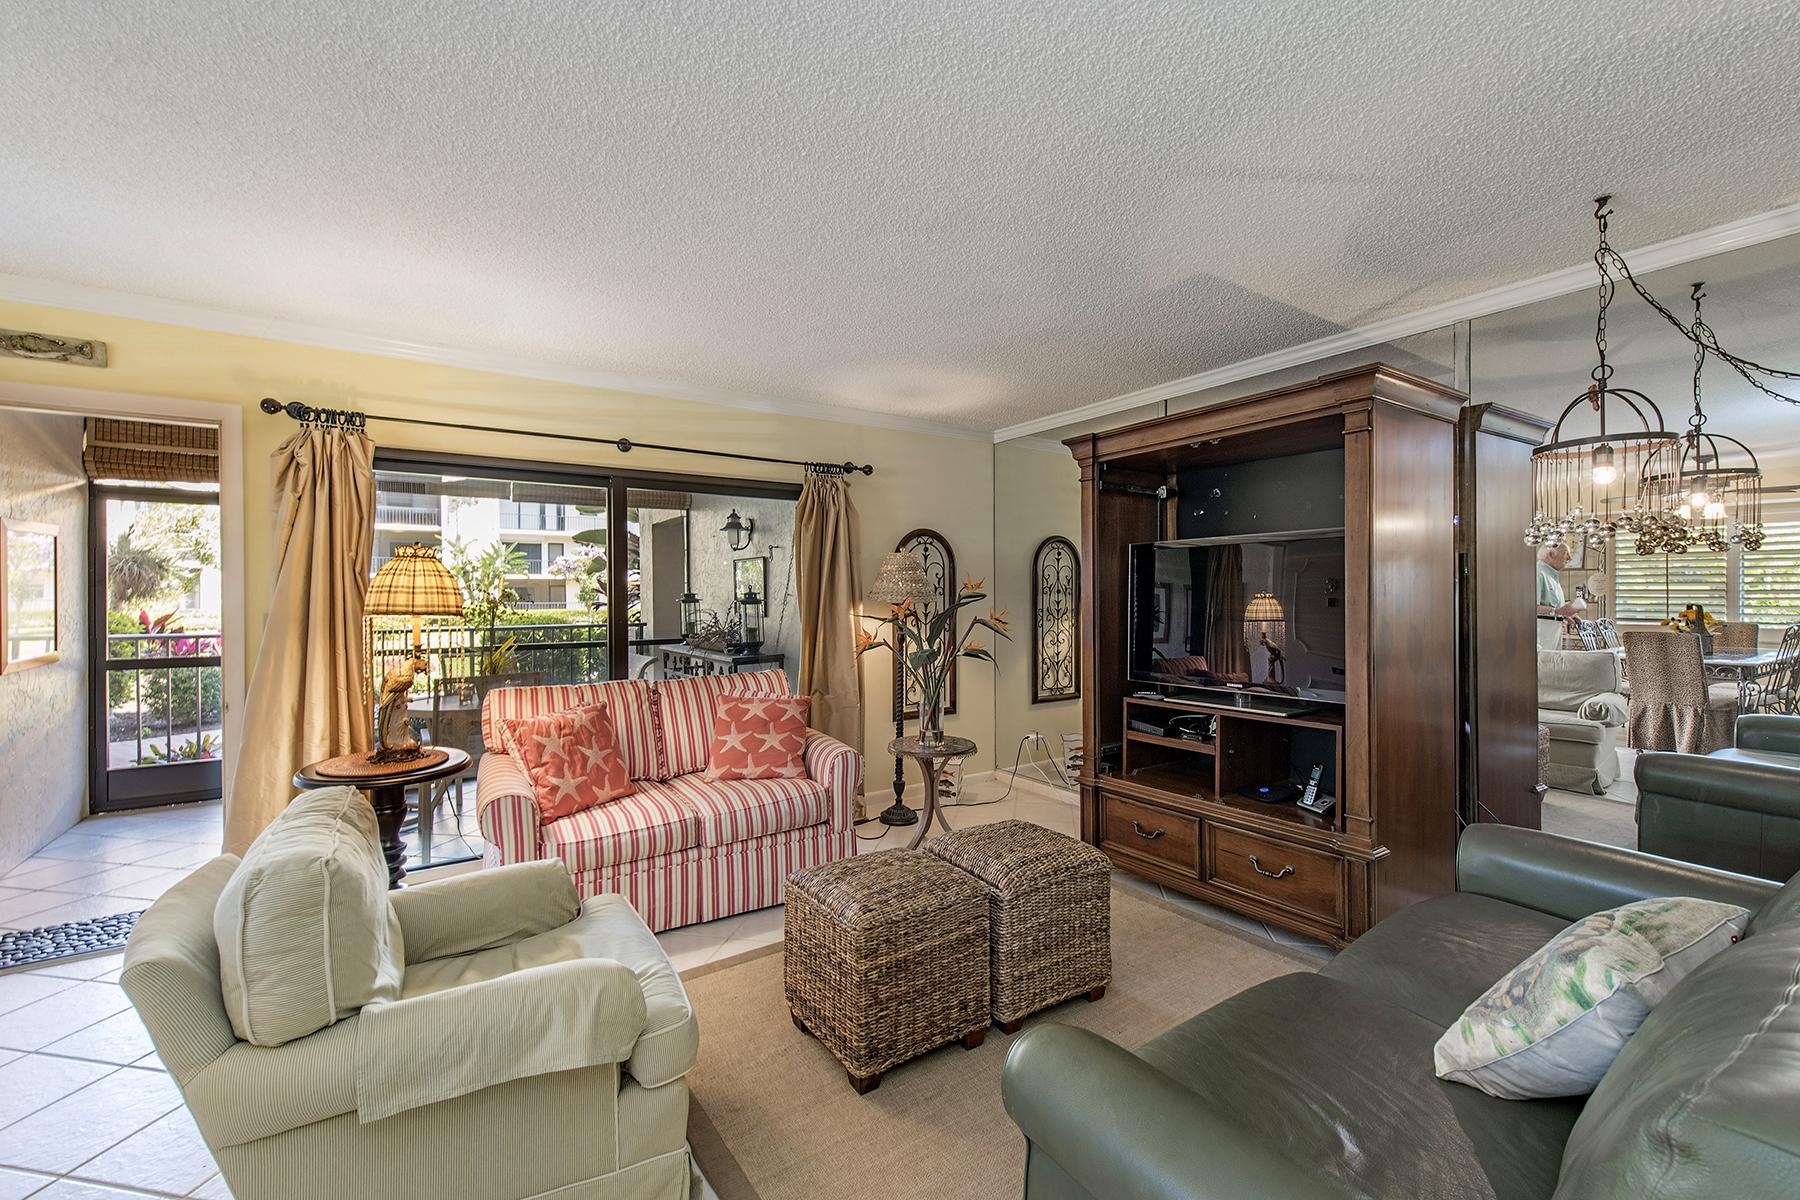 Condominium for Sale at Moorings-Bordeaux Club 2900 Gulf Shore Blvd N 111, Naples, Florida 34103 United States